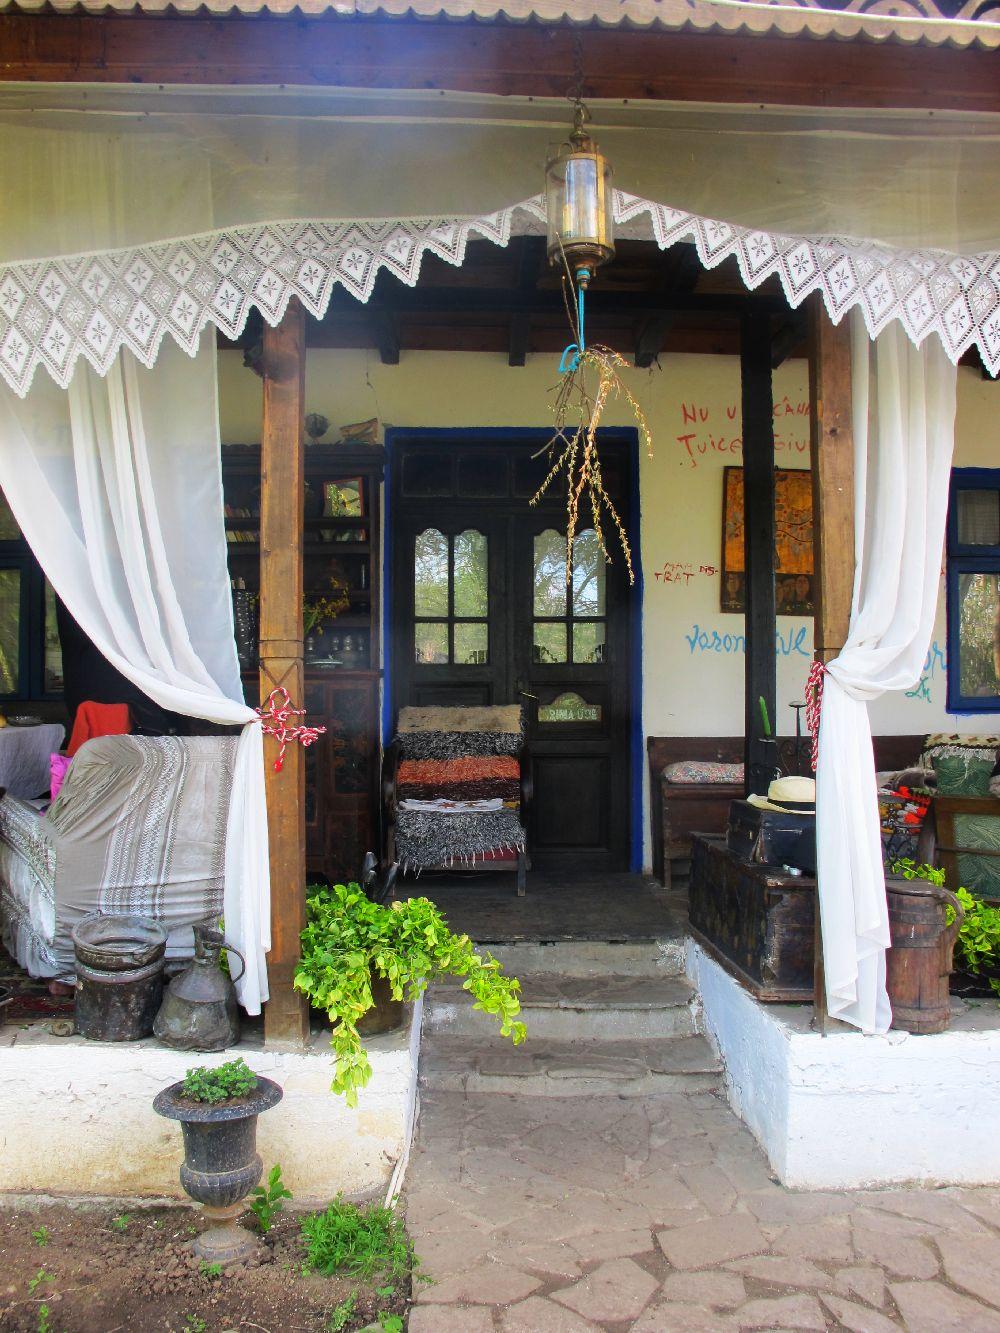 adelaparvu.com despre casa Ioanei Craciunescu, casa taraneasca romaneasca (92)